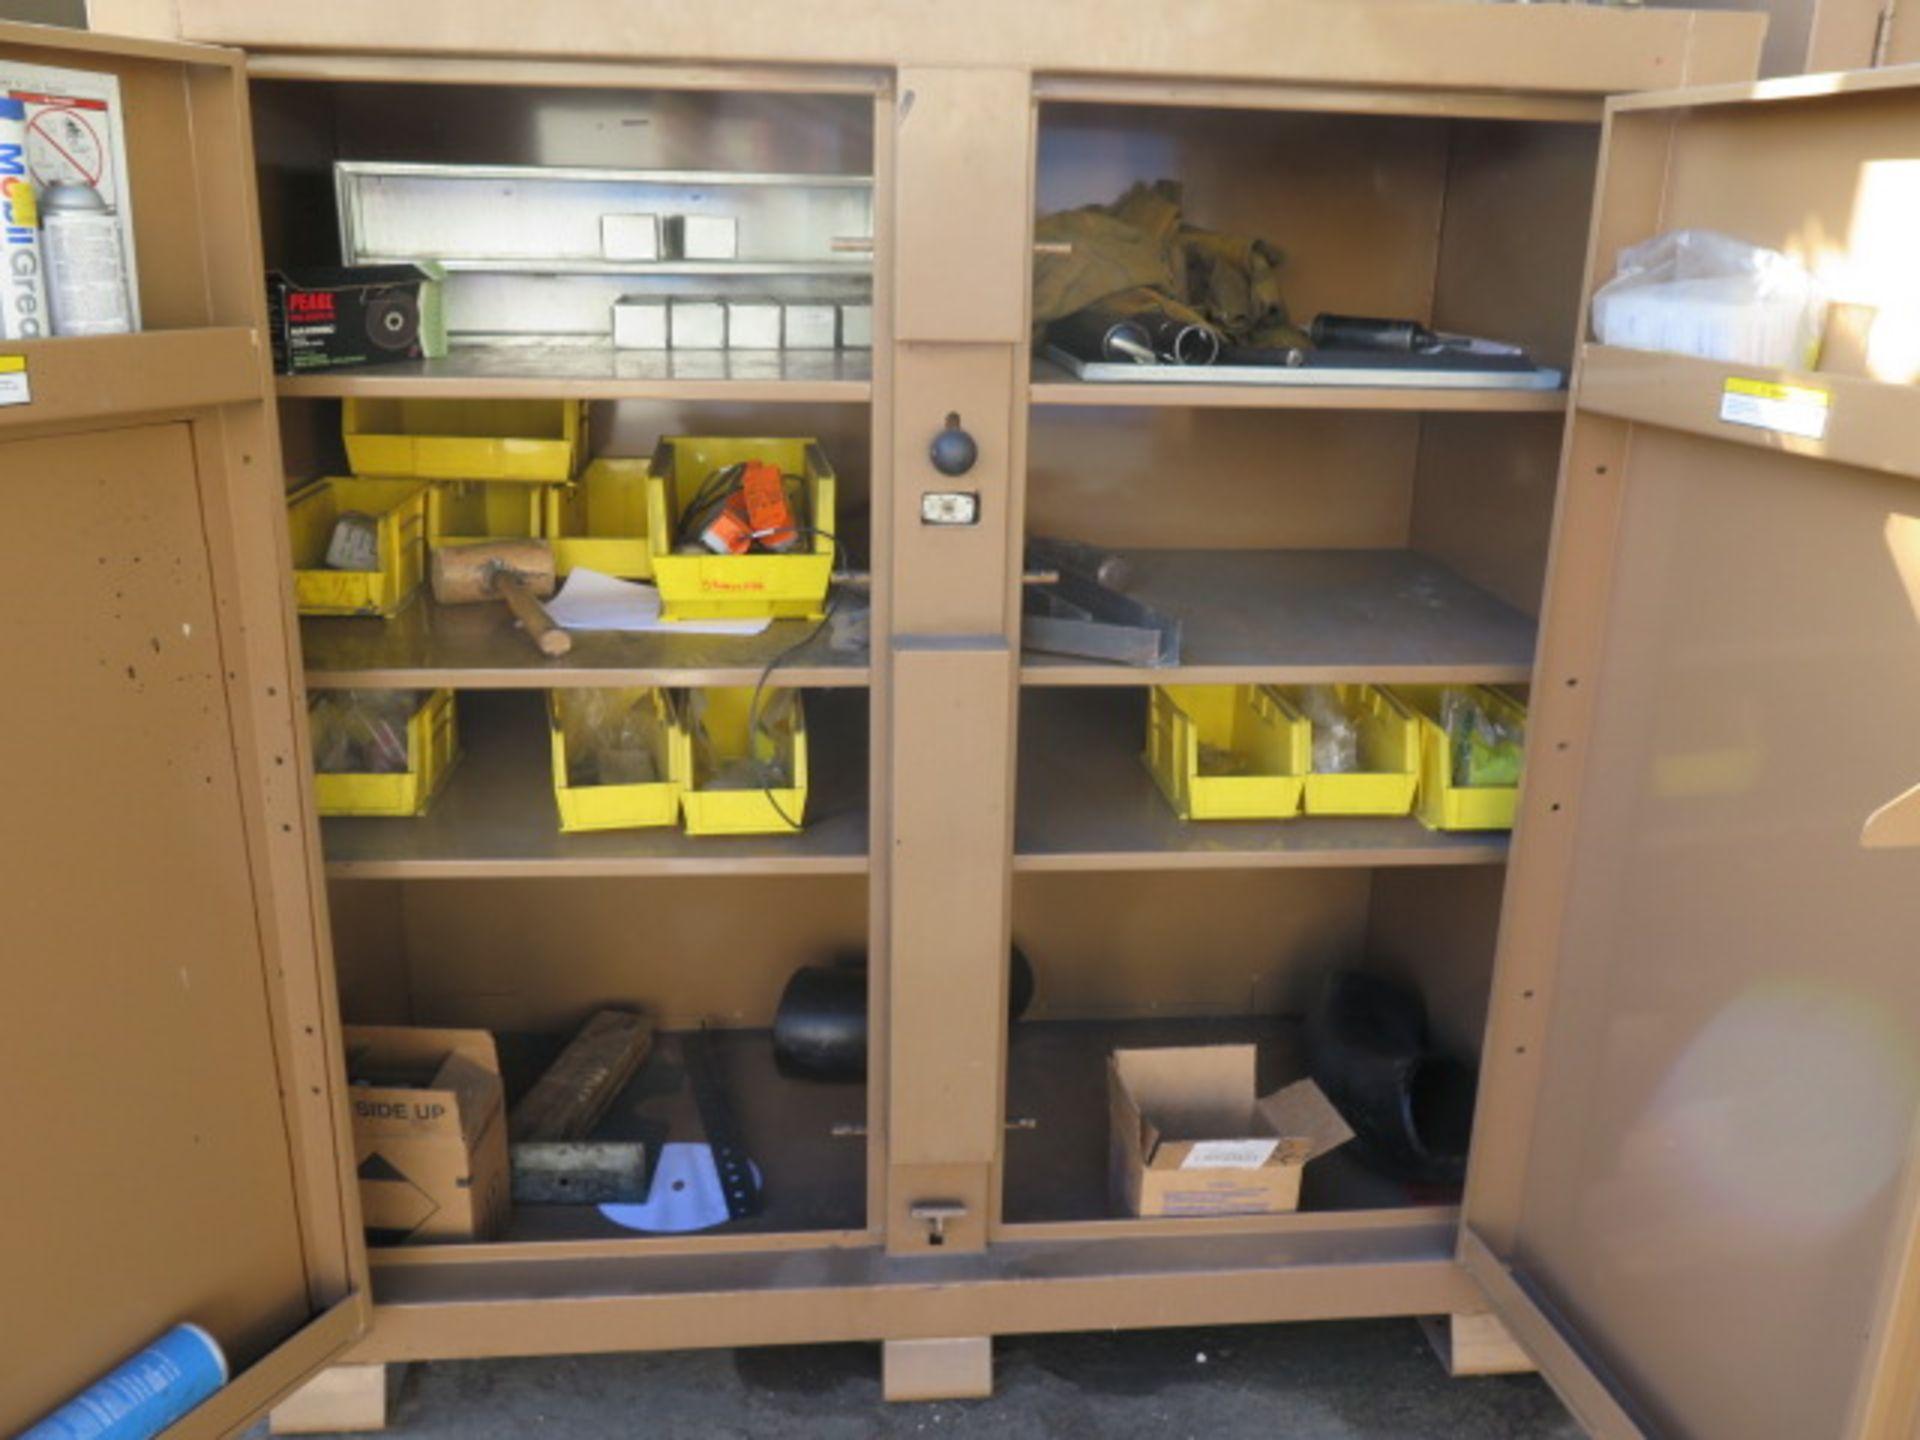 Knaack mdl. 139 Jobmaster Job Box (SOLD AS-IS - NO WARRANTY) - Image 4 of 17